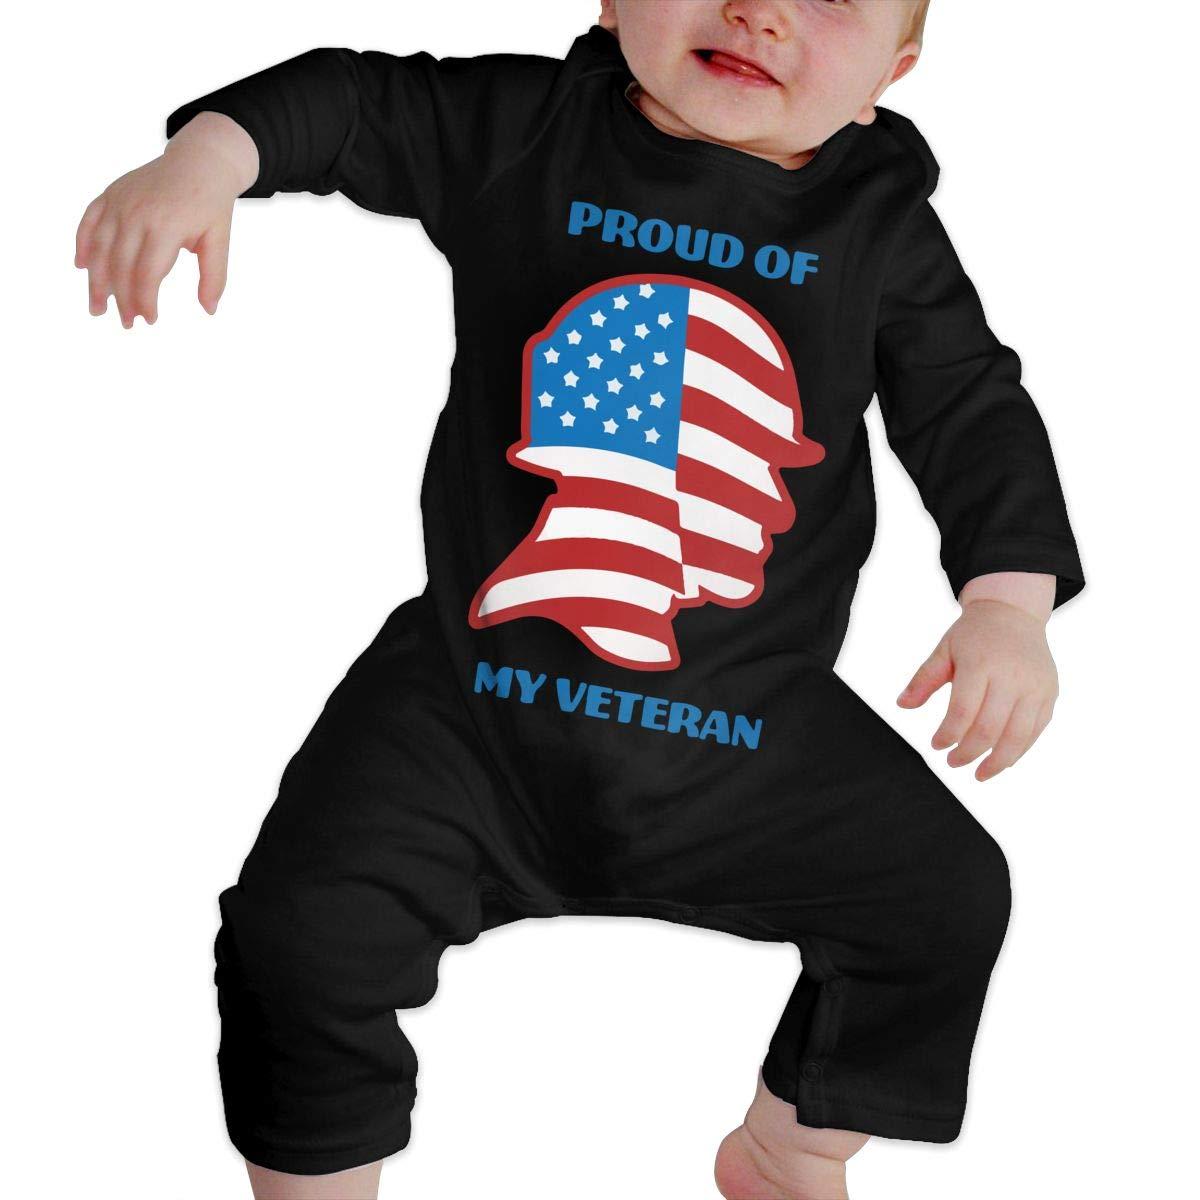 Db84UR@5p Infant Baby Girls Boys Long Sleeve Bodysuit Cute Proud of My Veteran Cotton Sleepwear